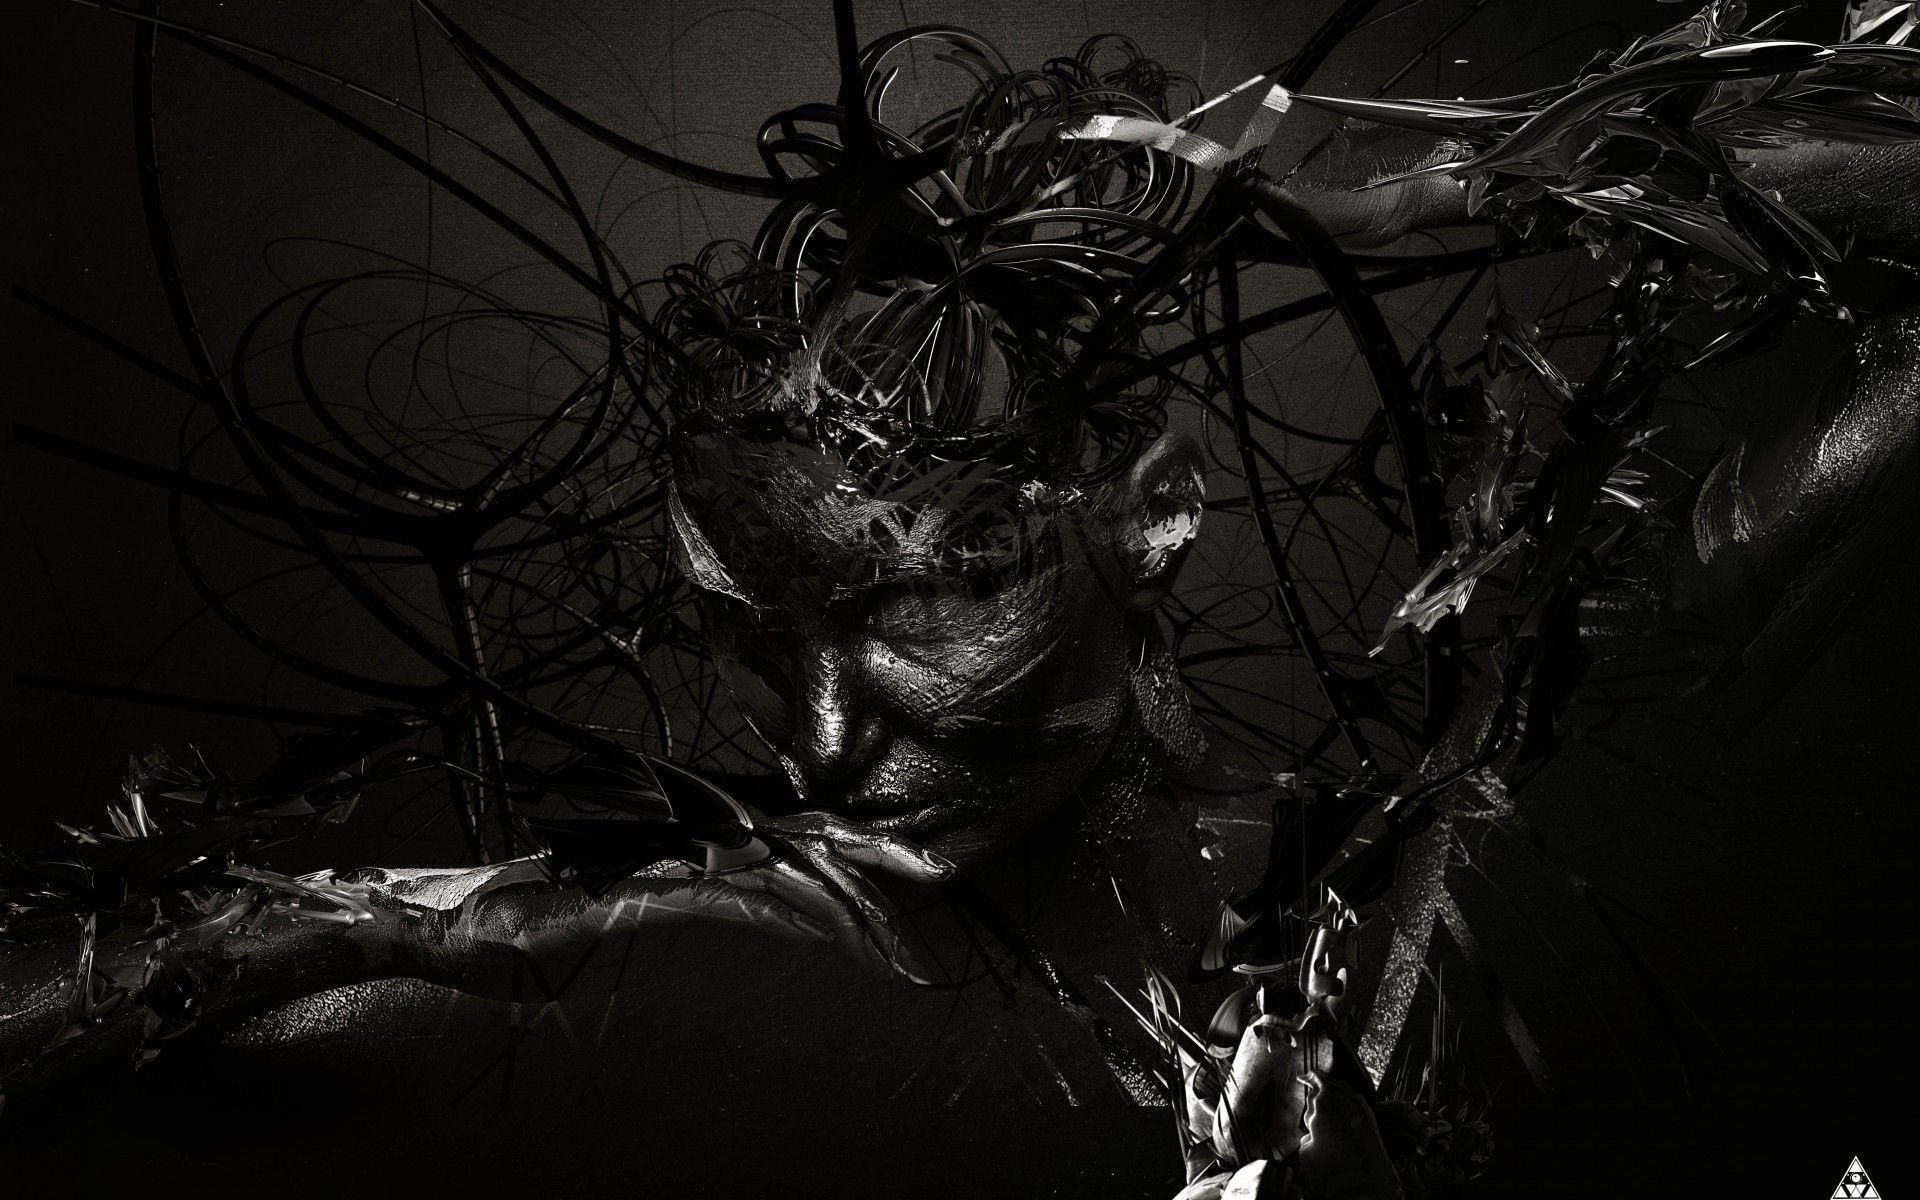 Aesthetic Dark Desktop Wallpapers - Top Free Aesthetic ...